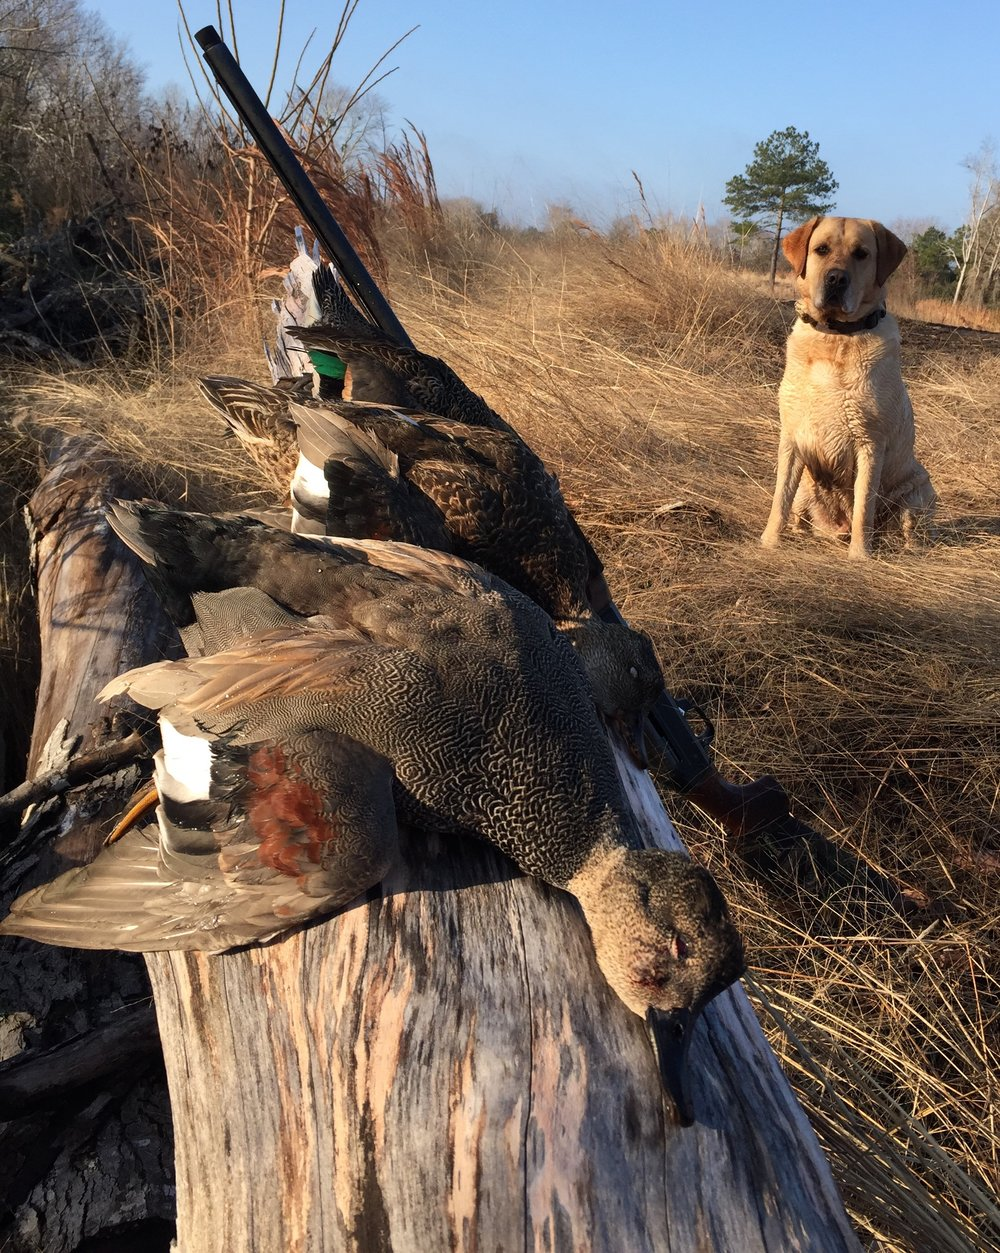 Hoss and Triple on ducks with gun.jpg